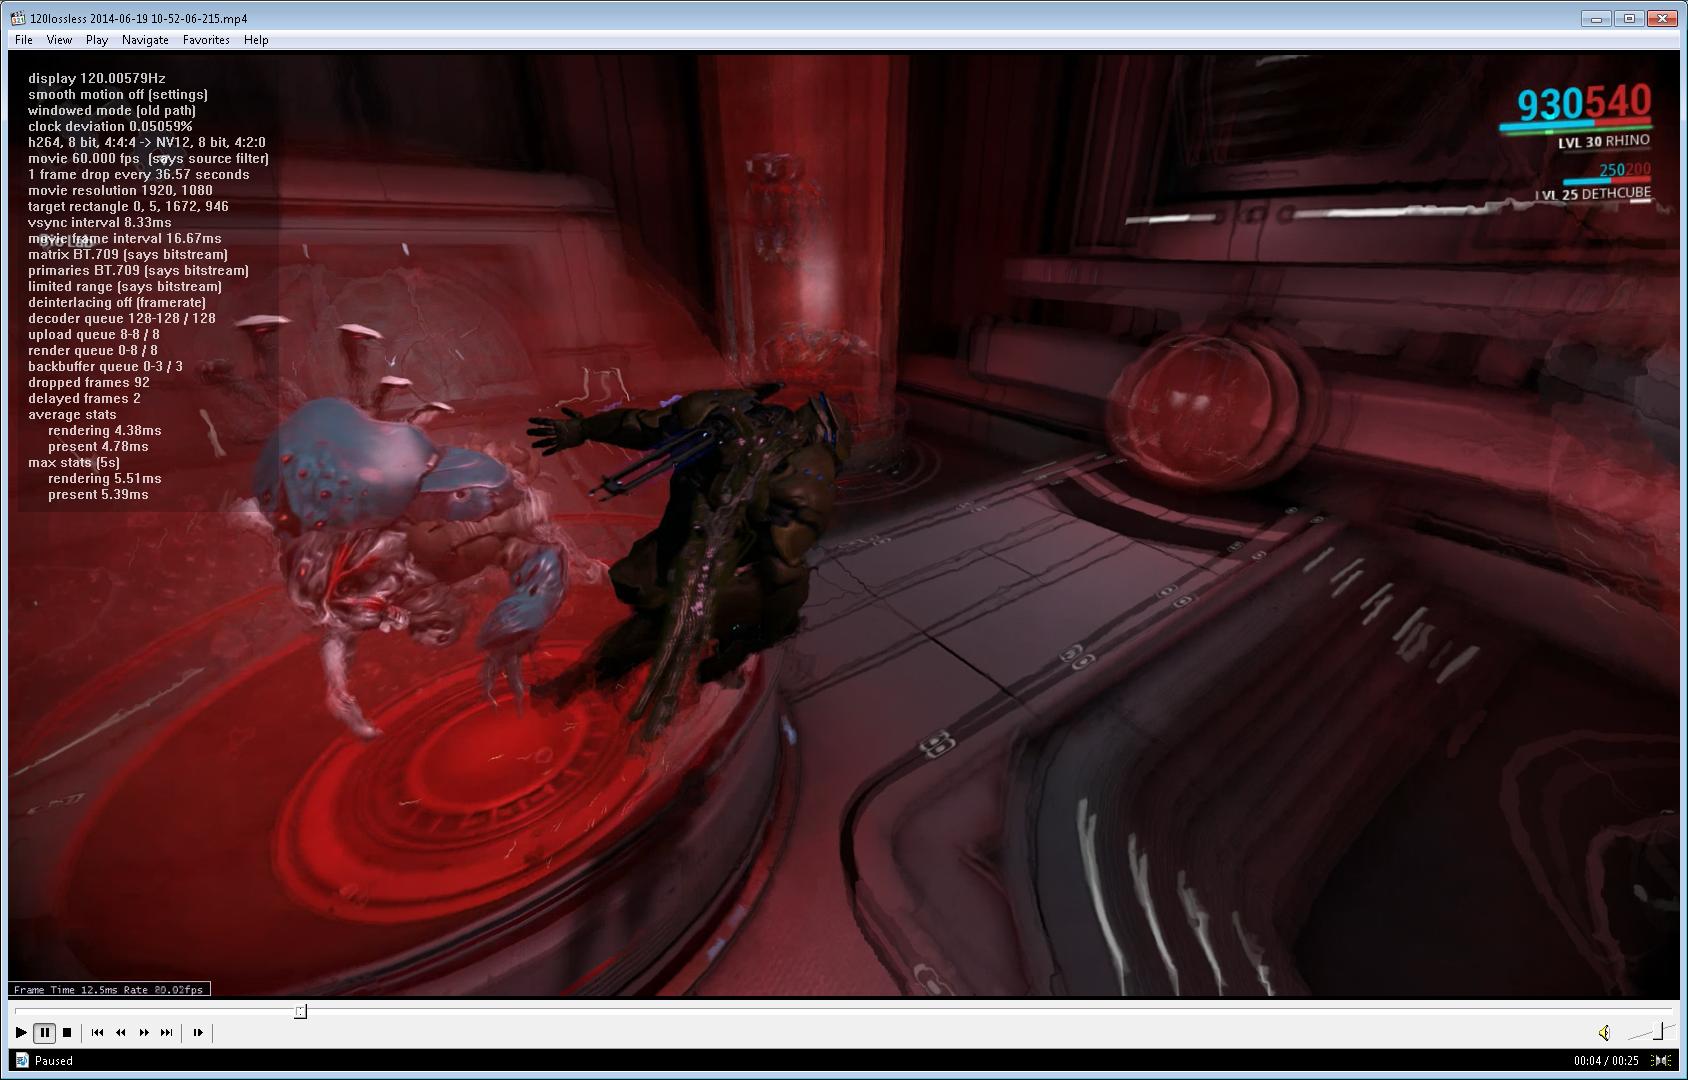 DmitriRender 2 0 0 3 - Doom9's Forum